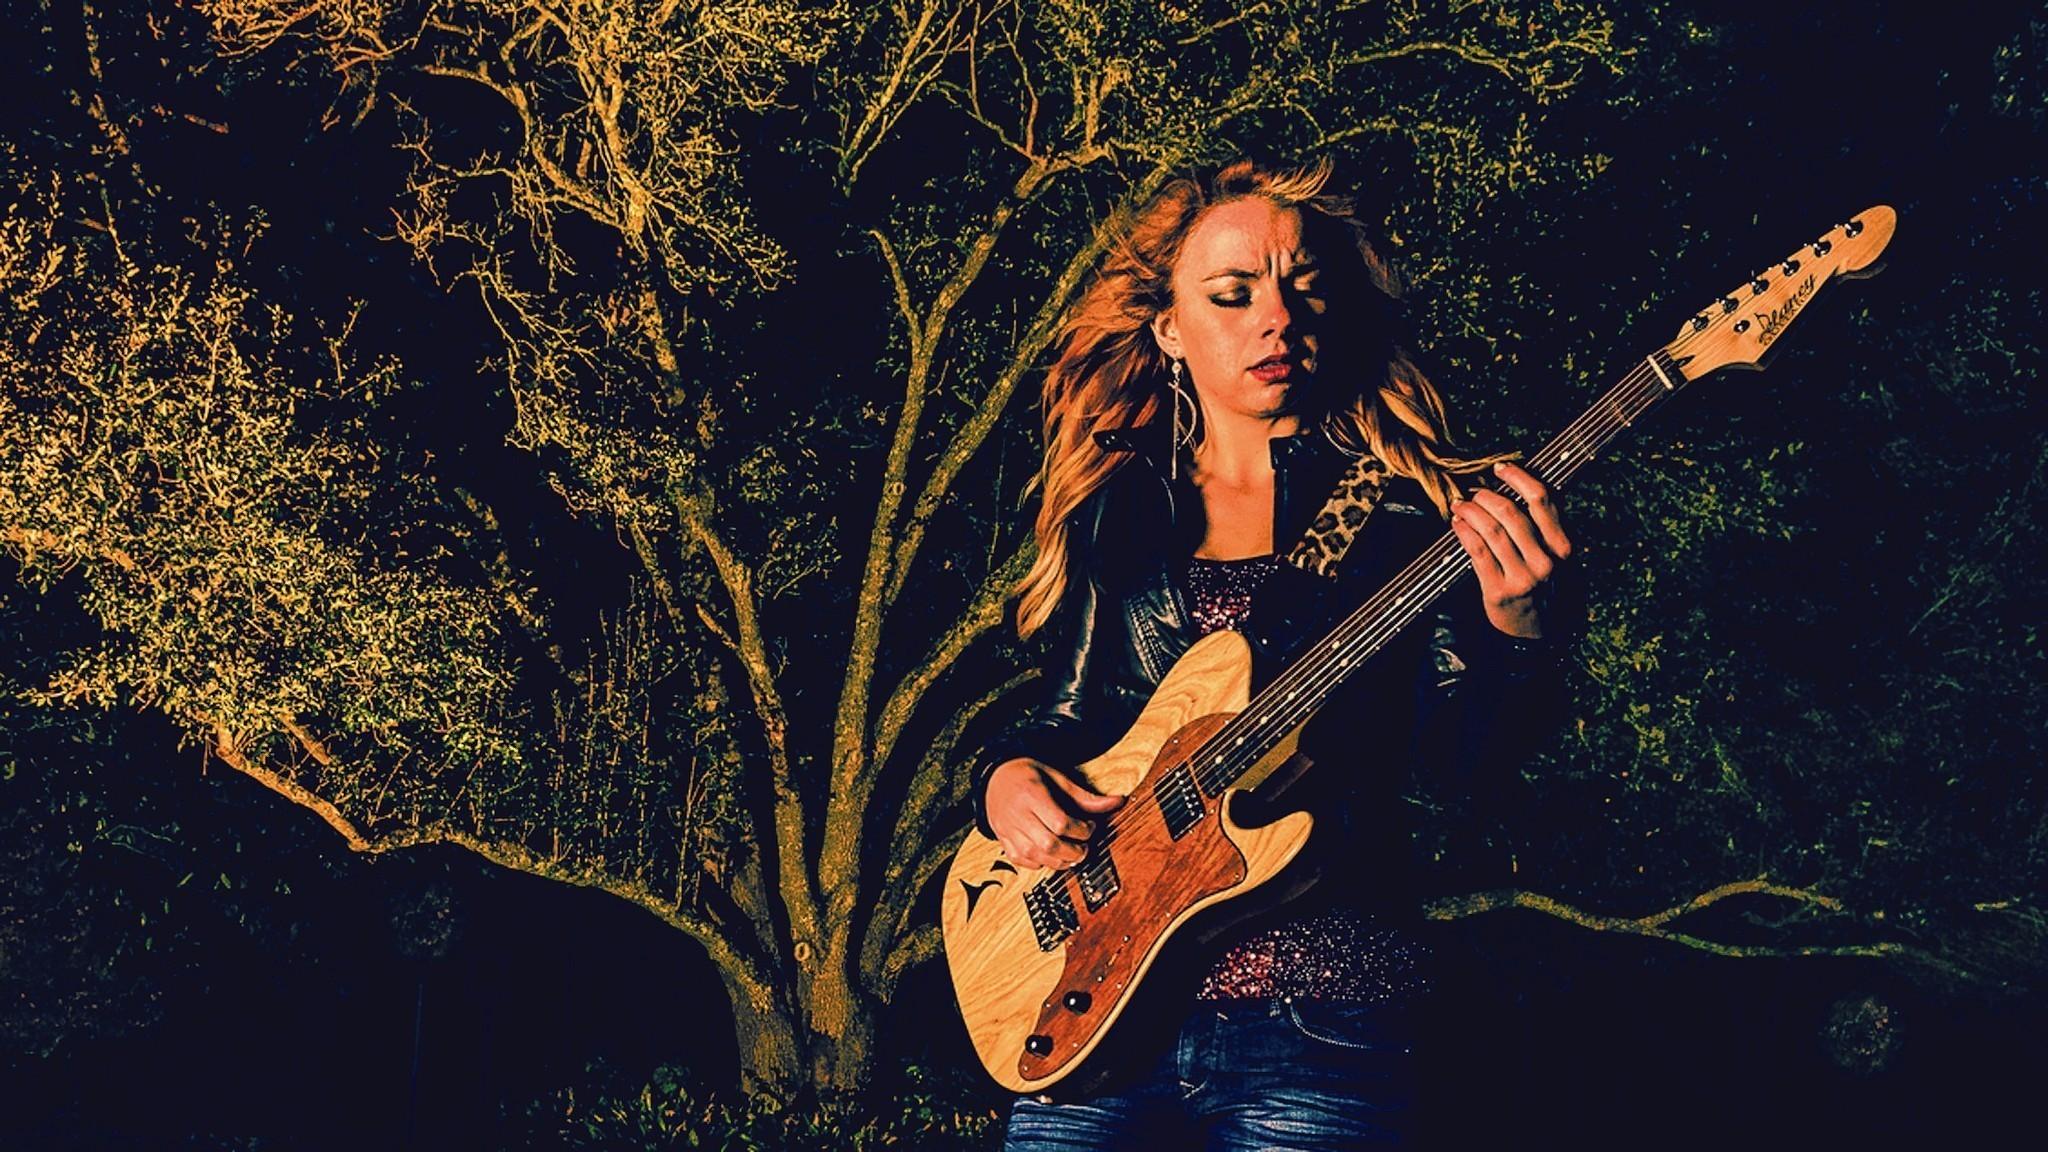 blues guitarist samantha fish to play sellersville theatre